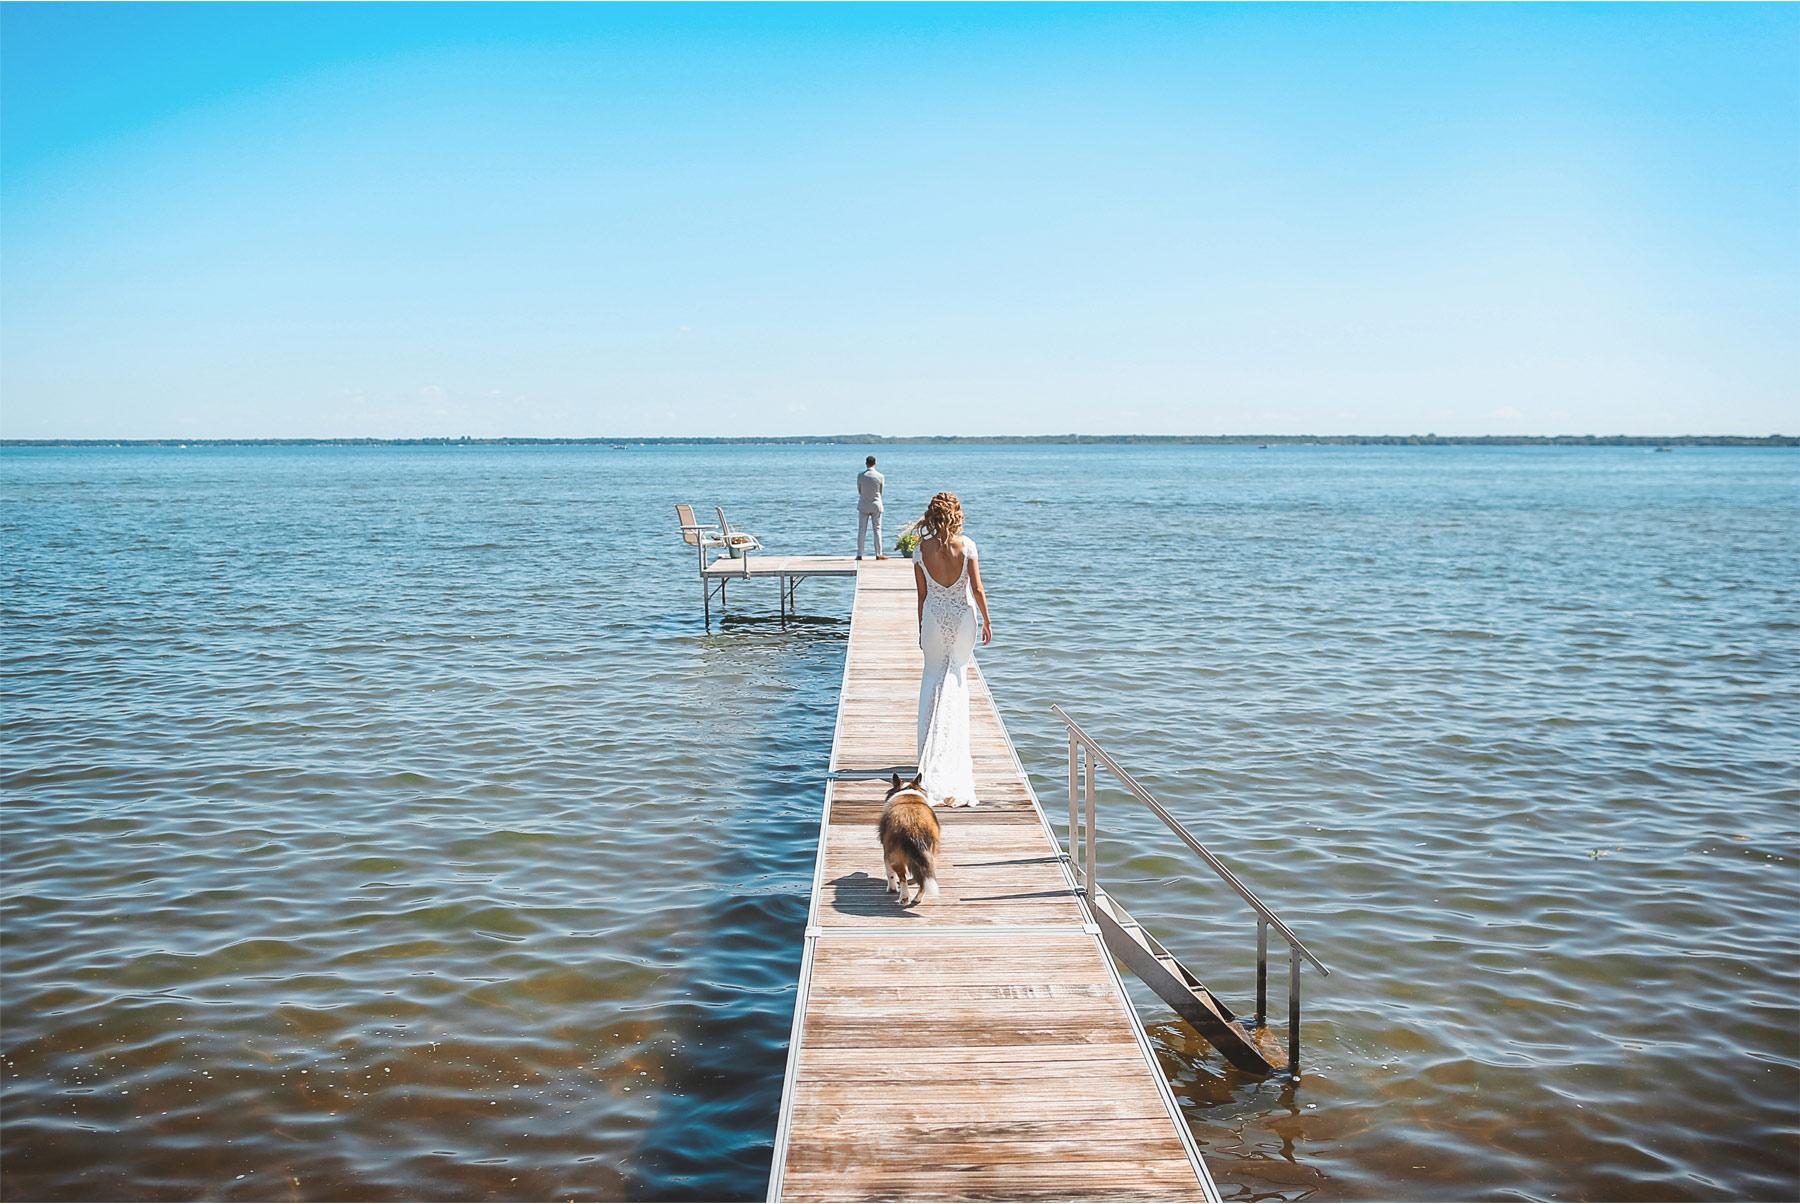 06-Vick-Photography-Wedding-Ottertail-Minnesota-Alice-in-Wonderland-Theme-First-Look-Bride-Groom-Lake-Dock-Tess-and-Greg.jpg